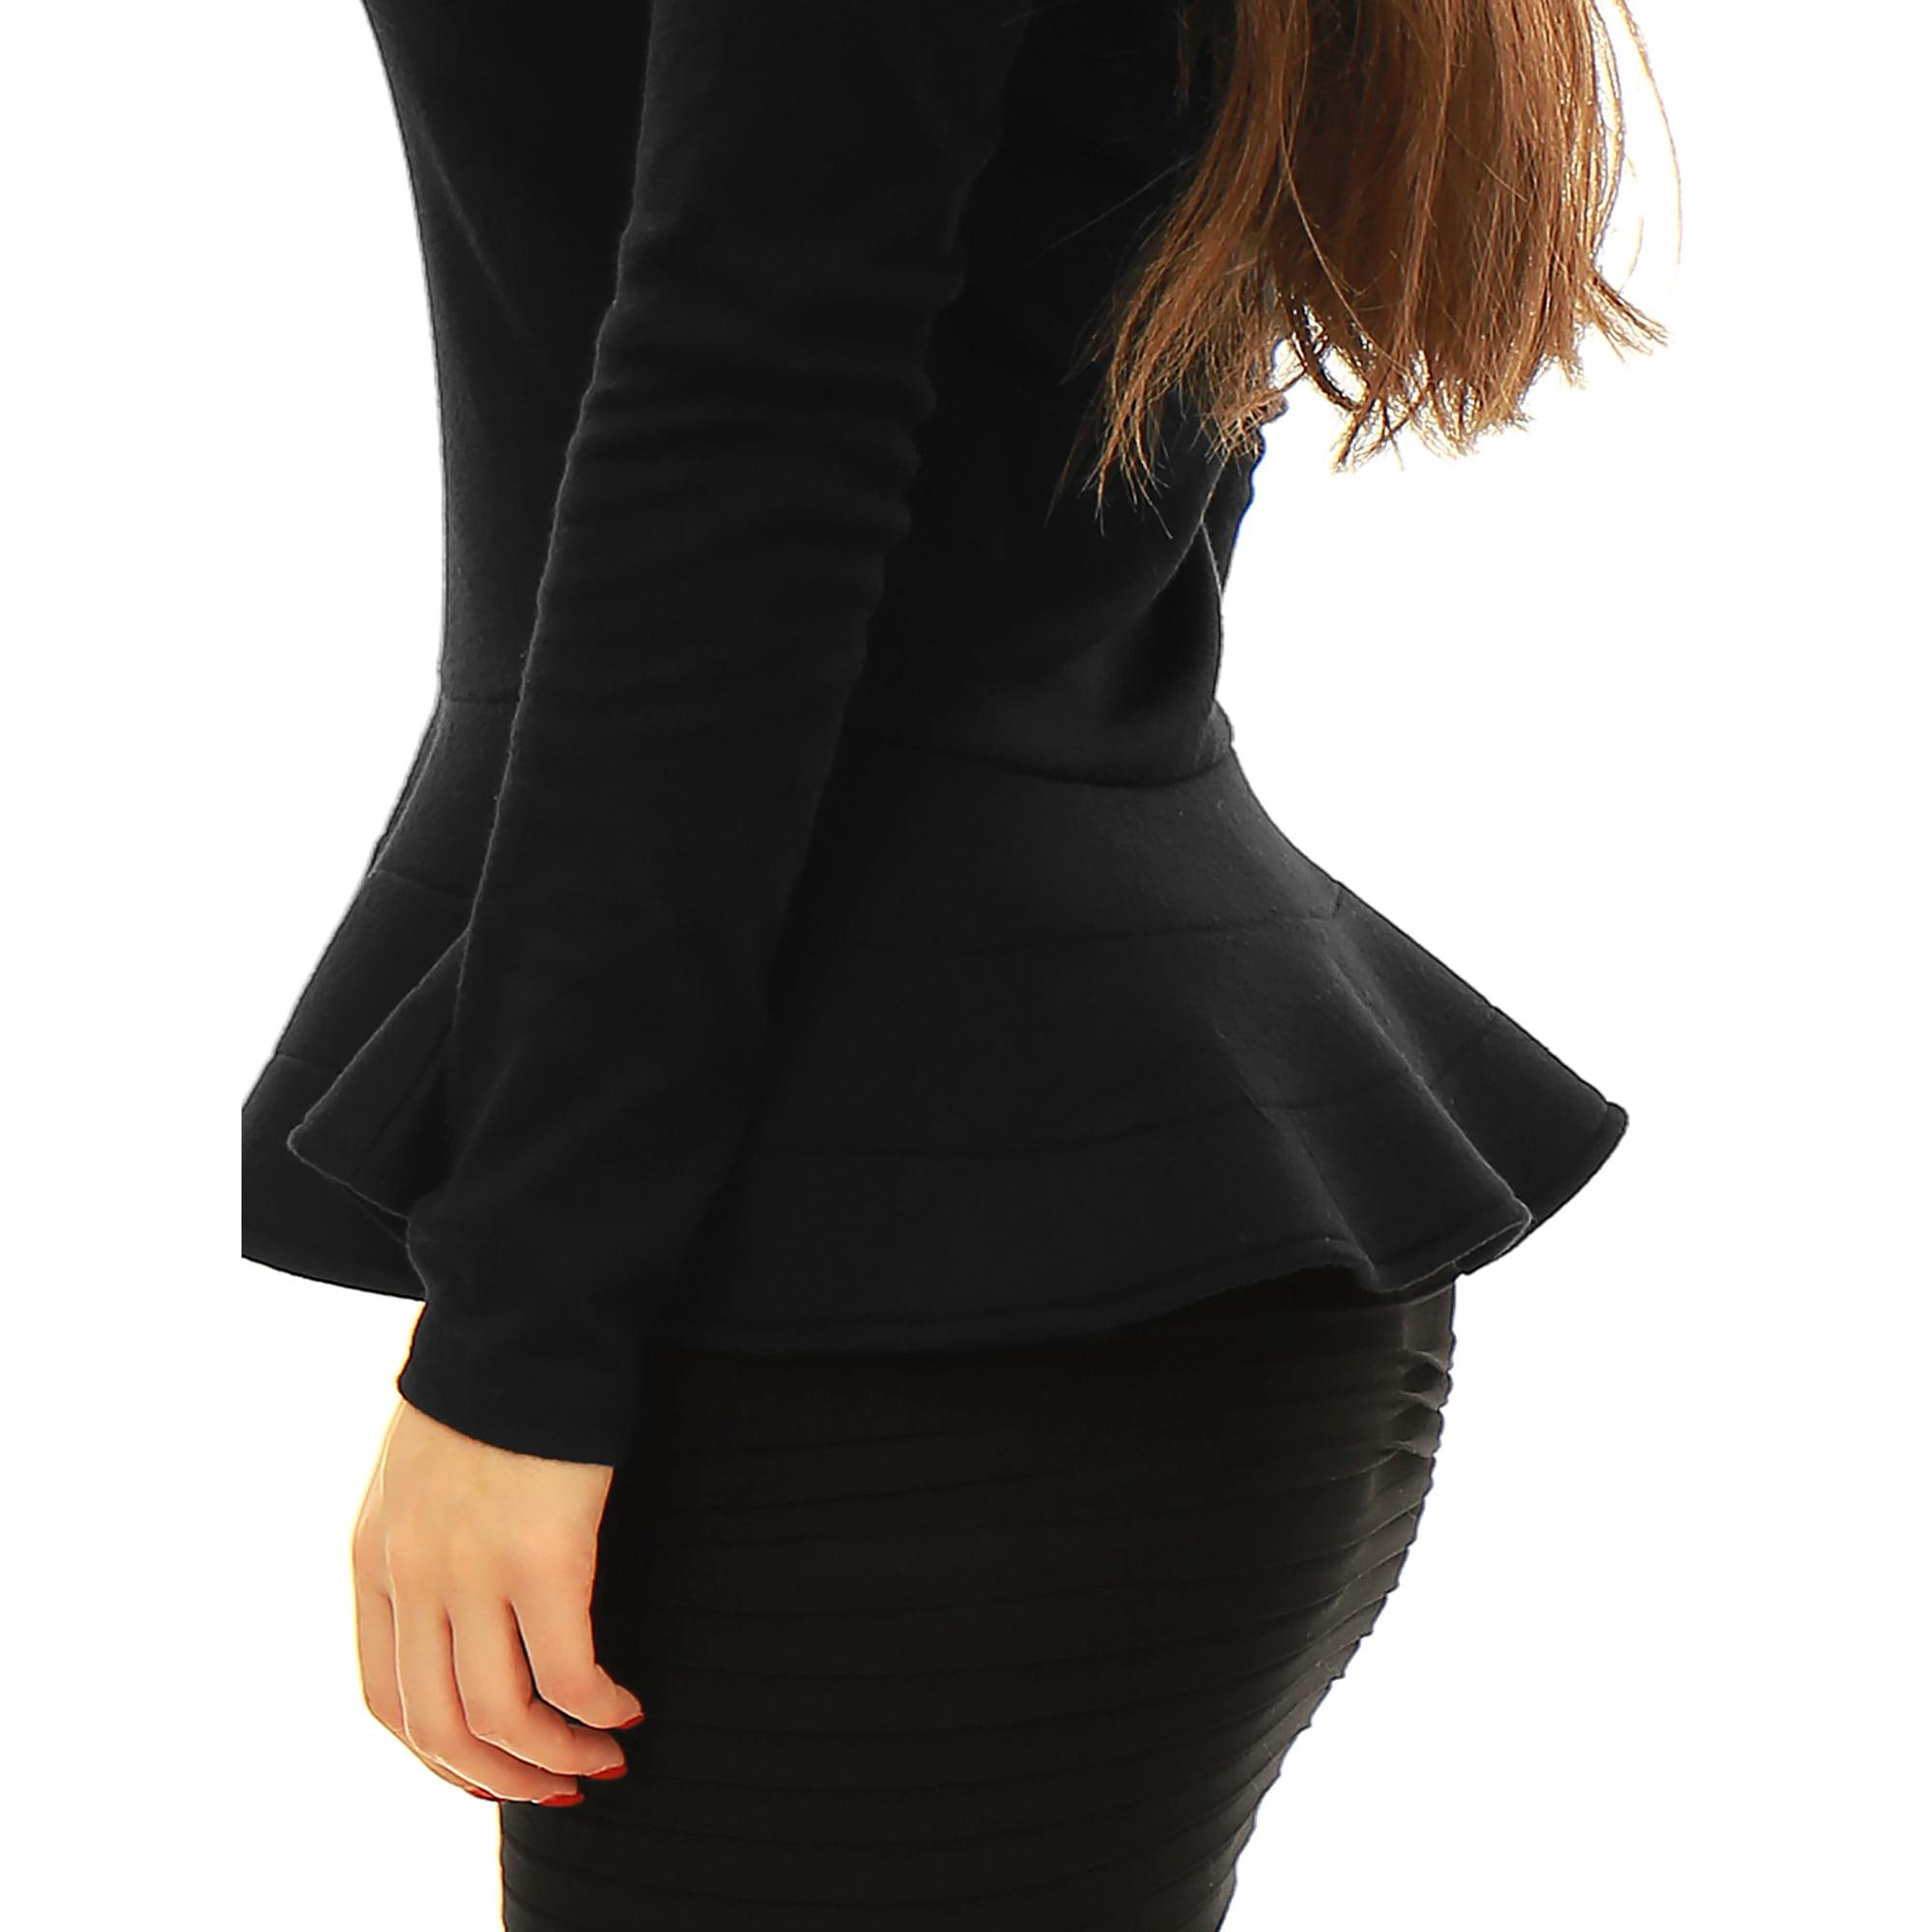 1df16568dc4967 Allegra K Lady Off Shoulder Hidden Zipper Side Design Casual Peplum Top  Black XS